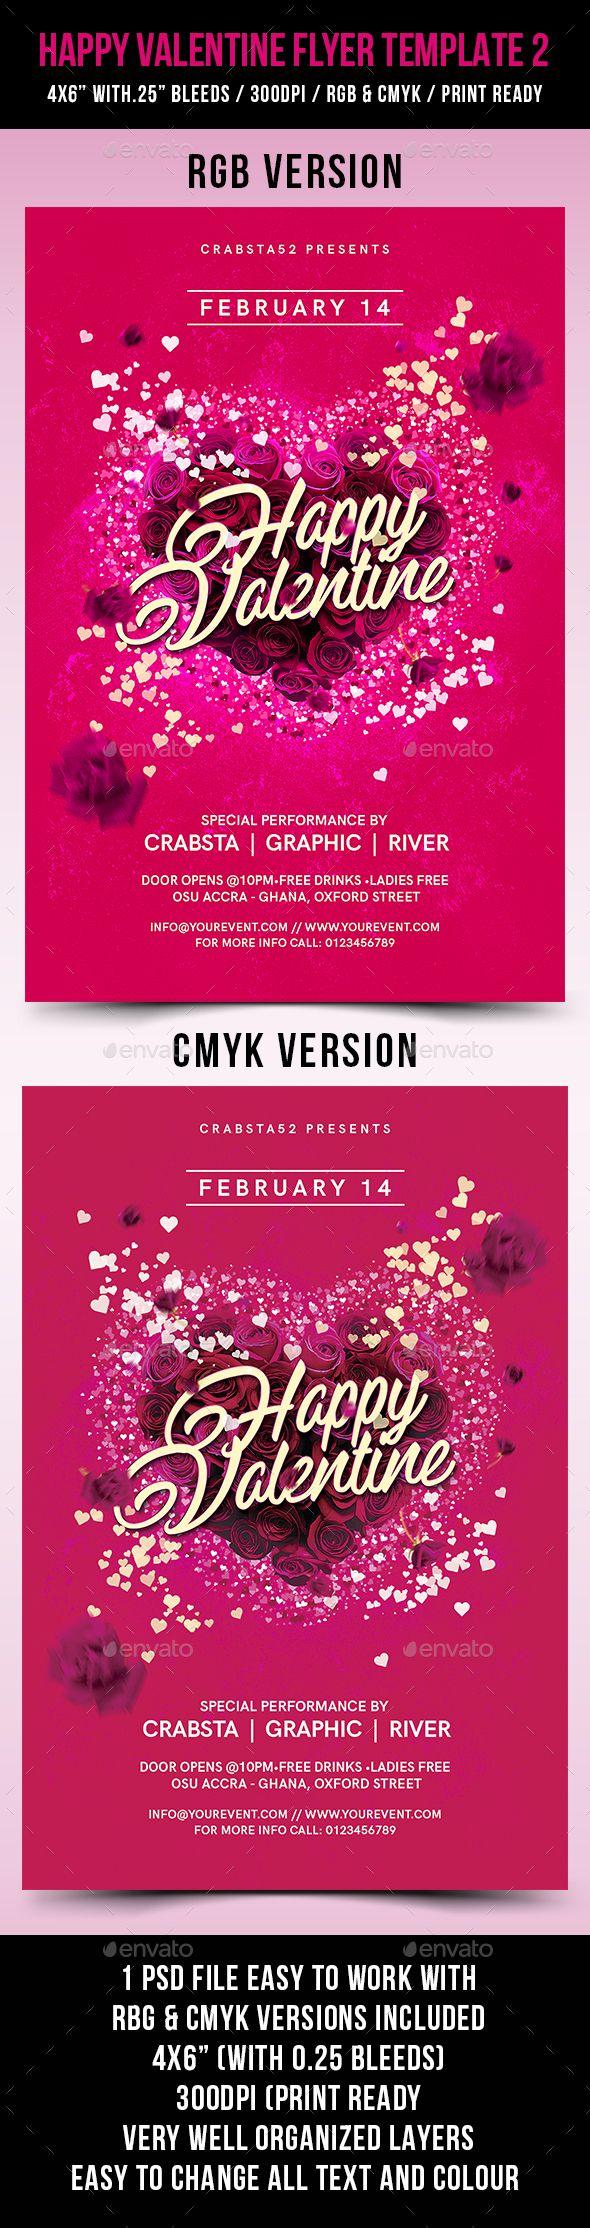 valentines flyer template